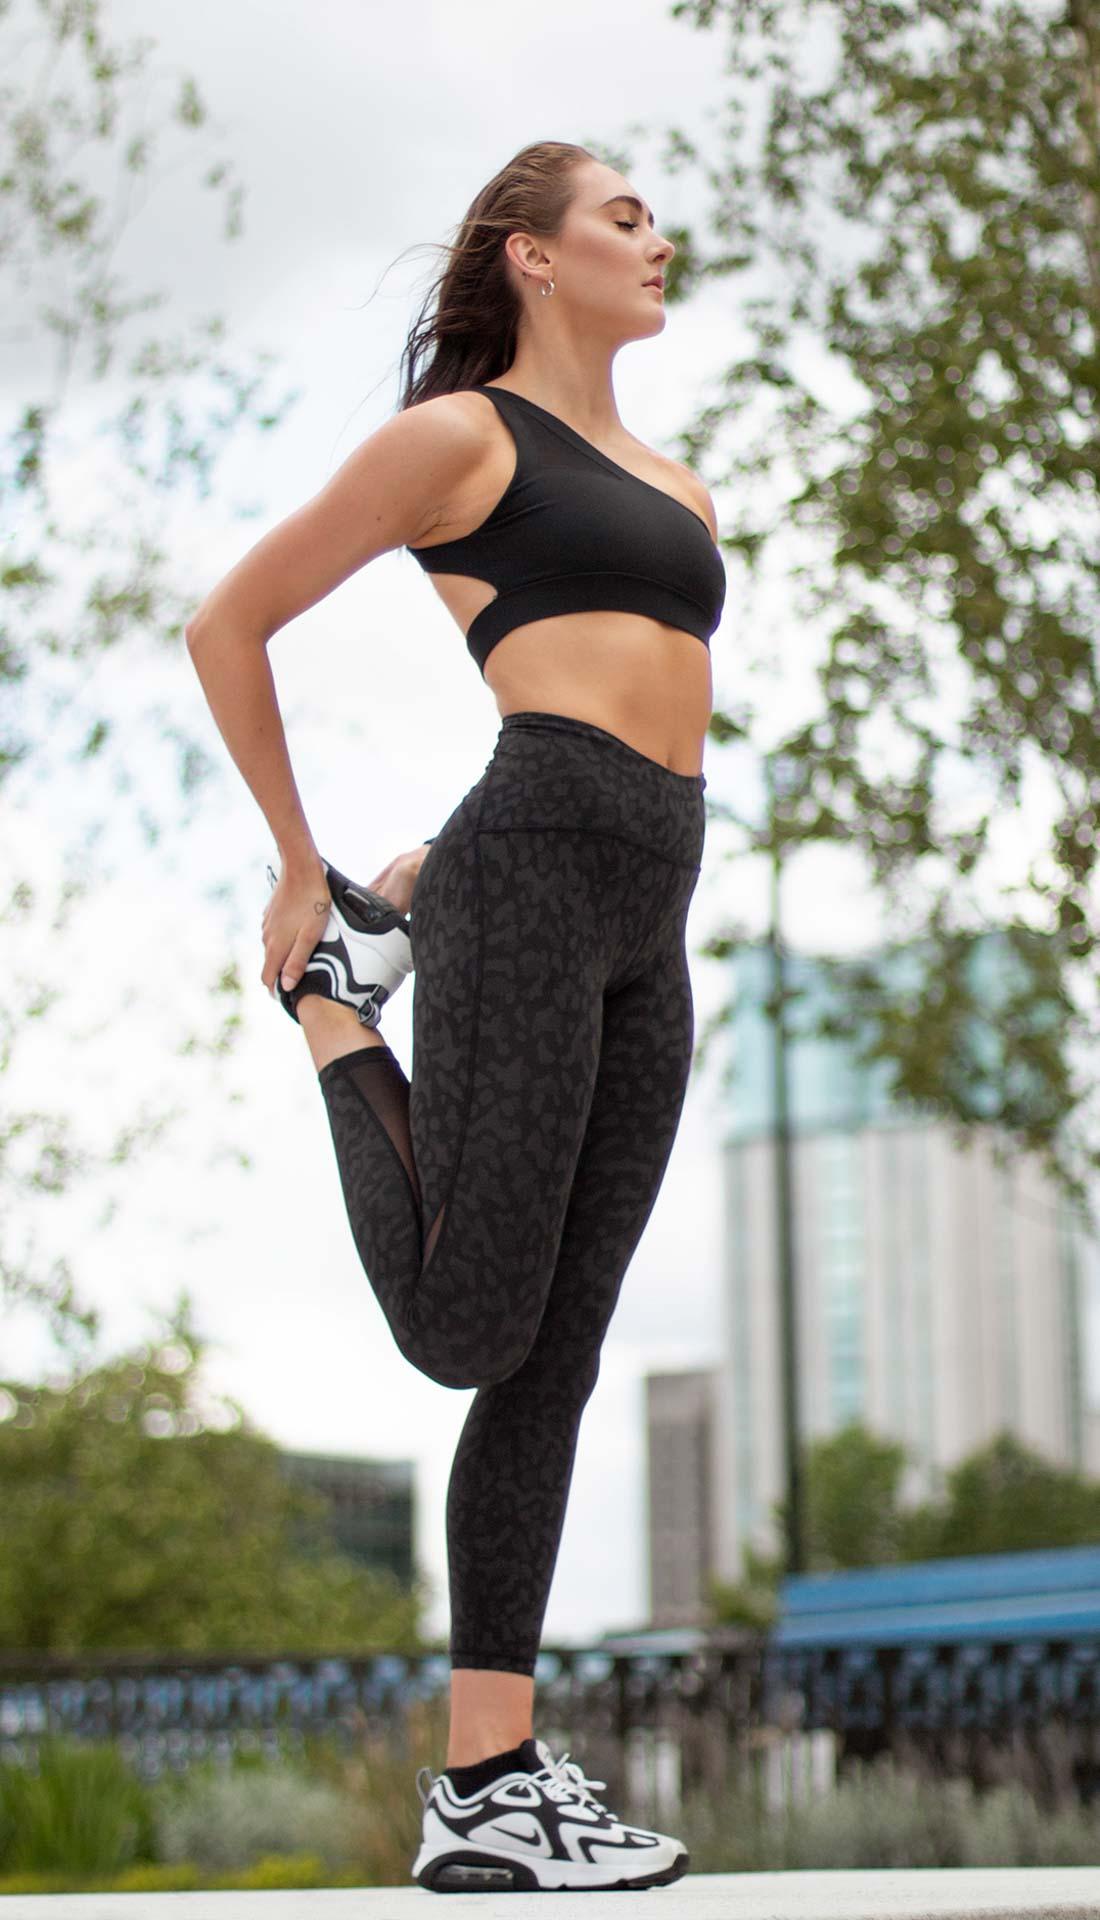 Fitness wear fashion photoshoot, Birmingham fashion photographer, outdoor fitness photoshoot in Birmingham city centre